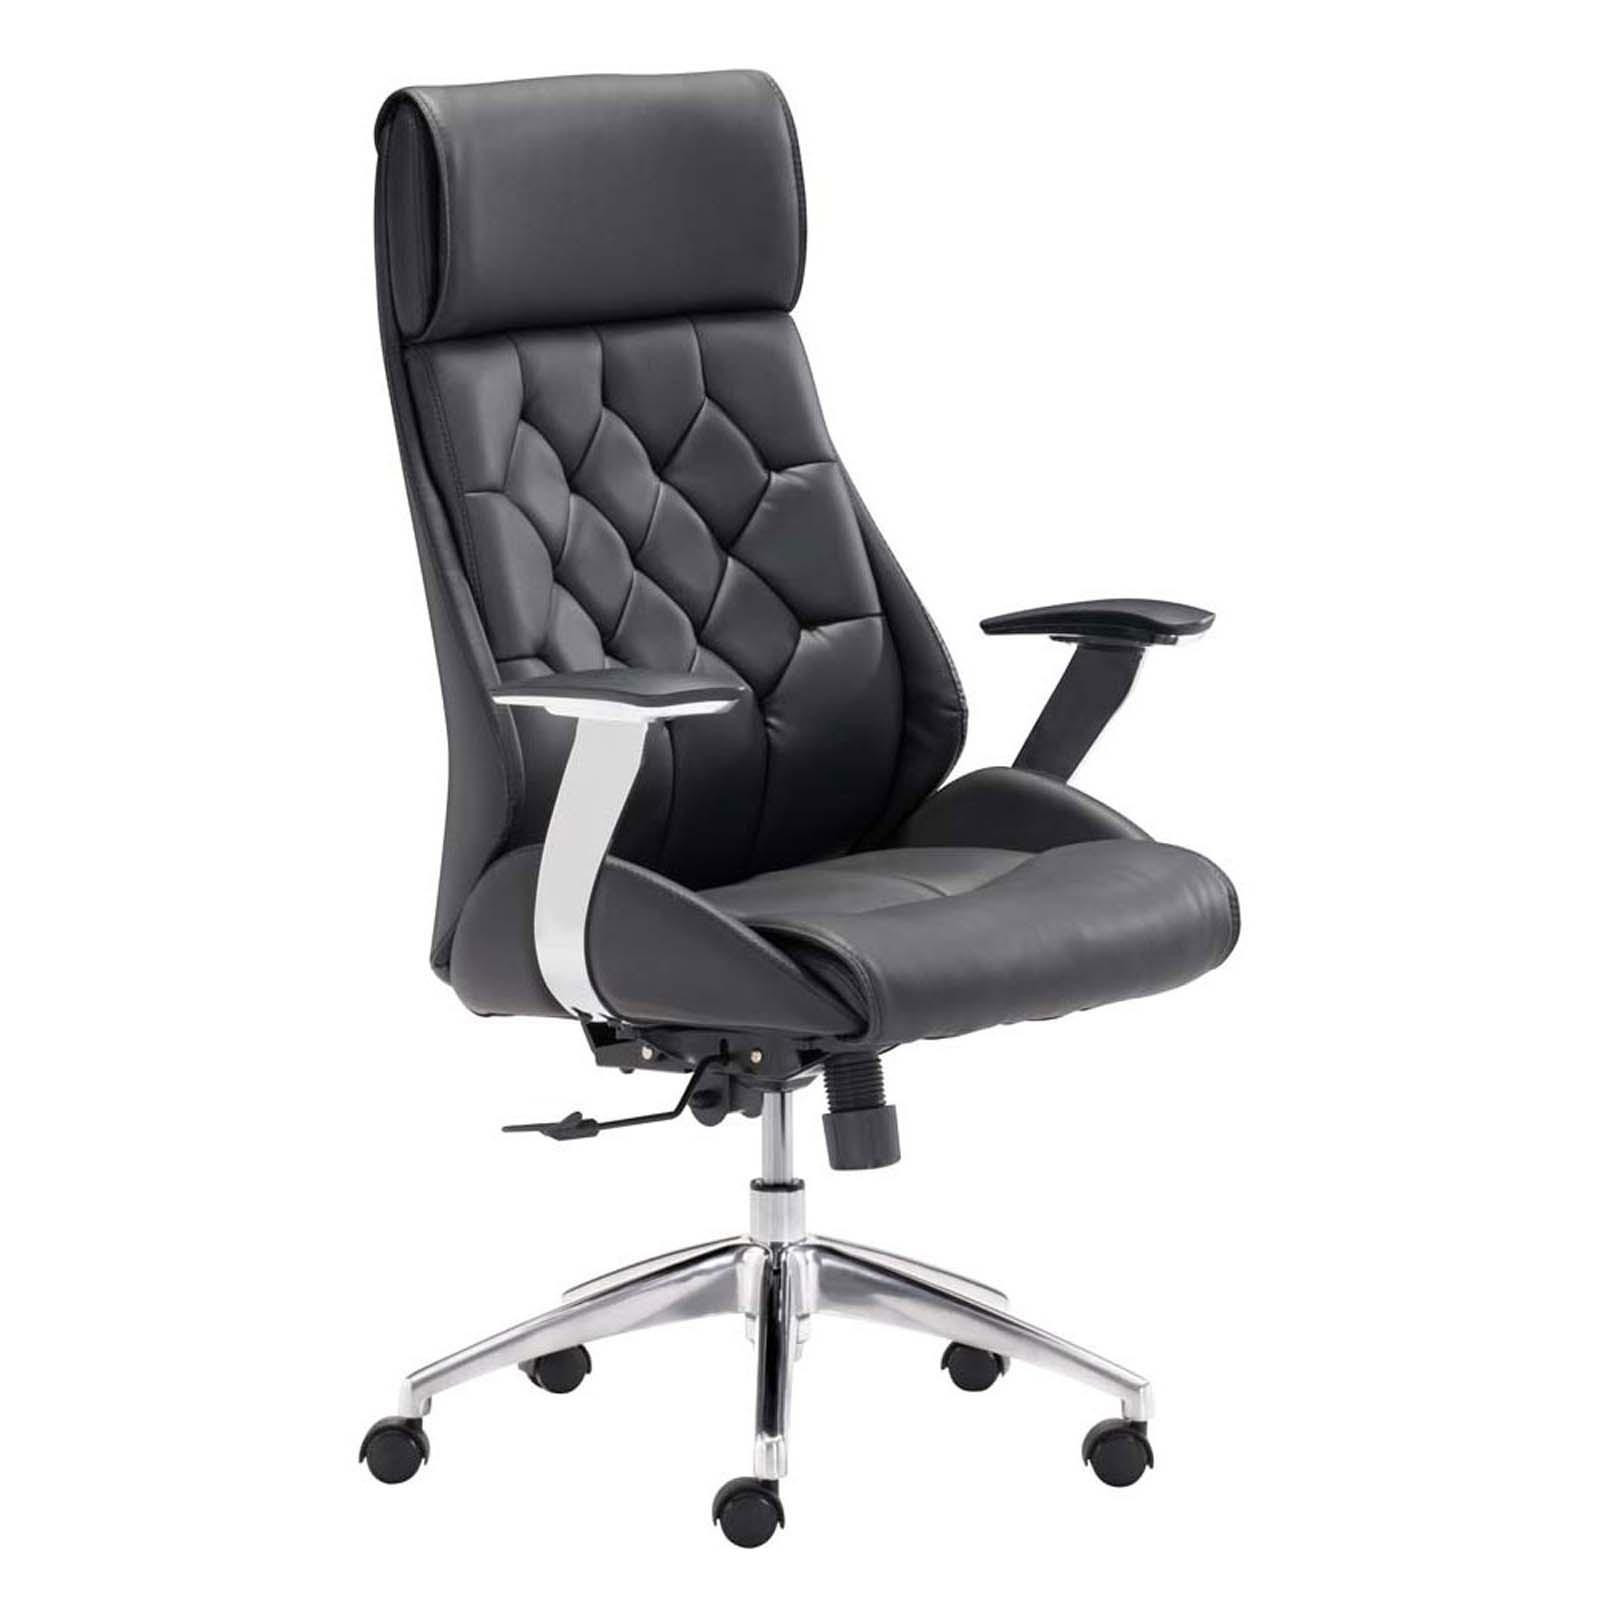 Boutique Office Chair Black